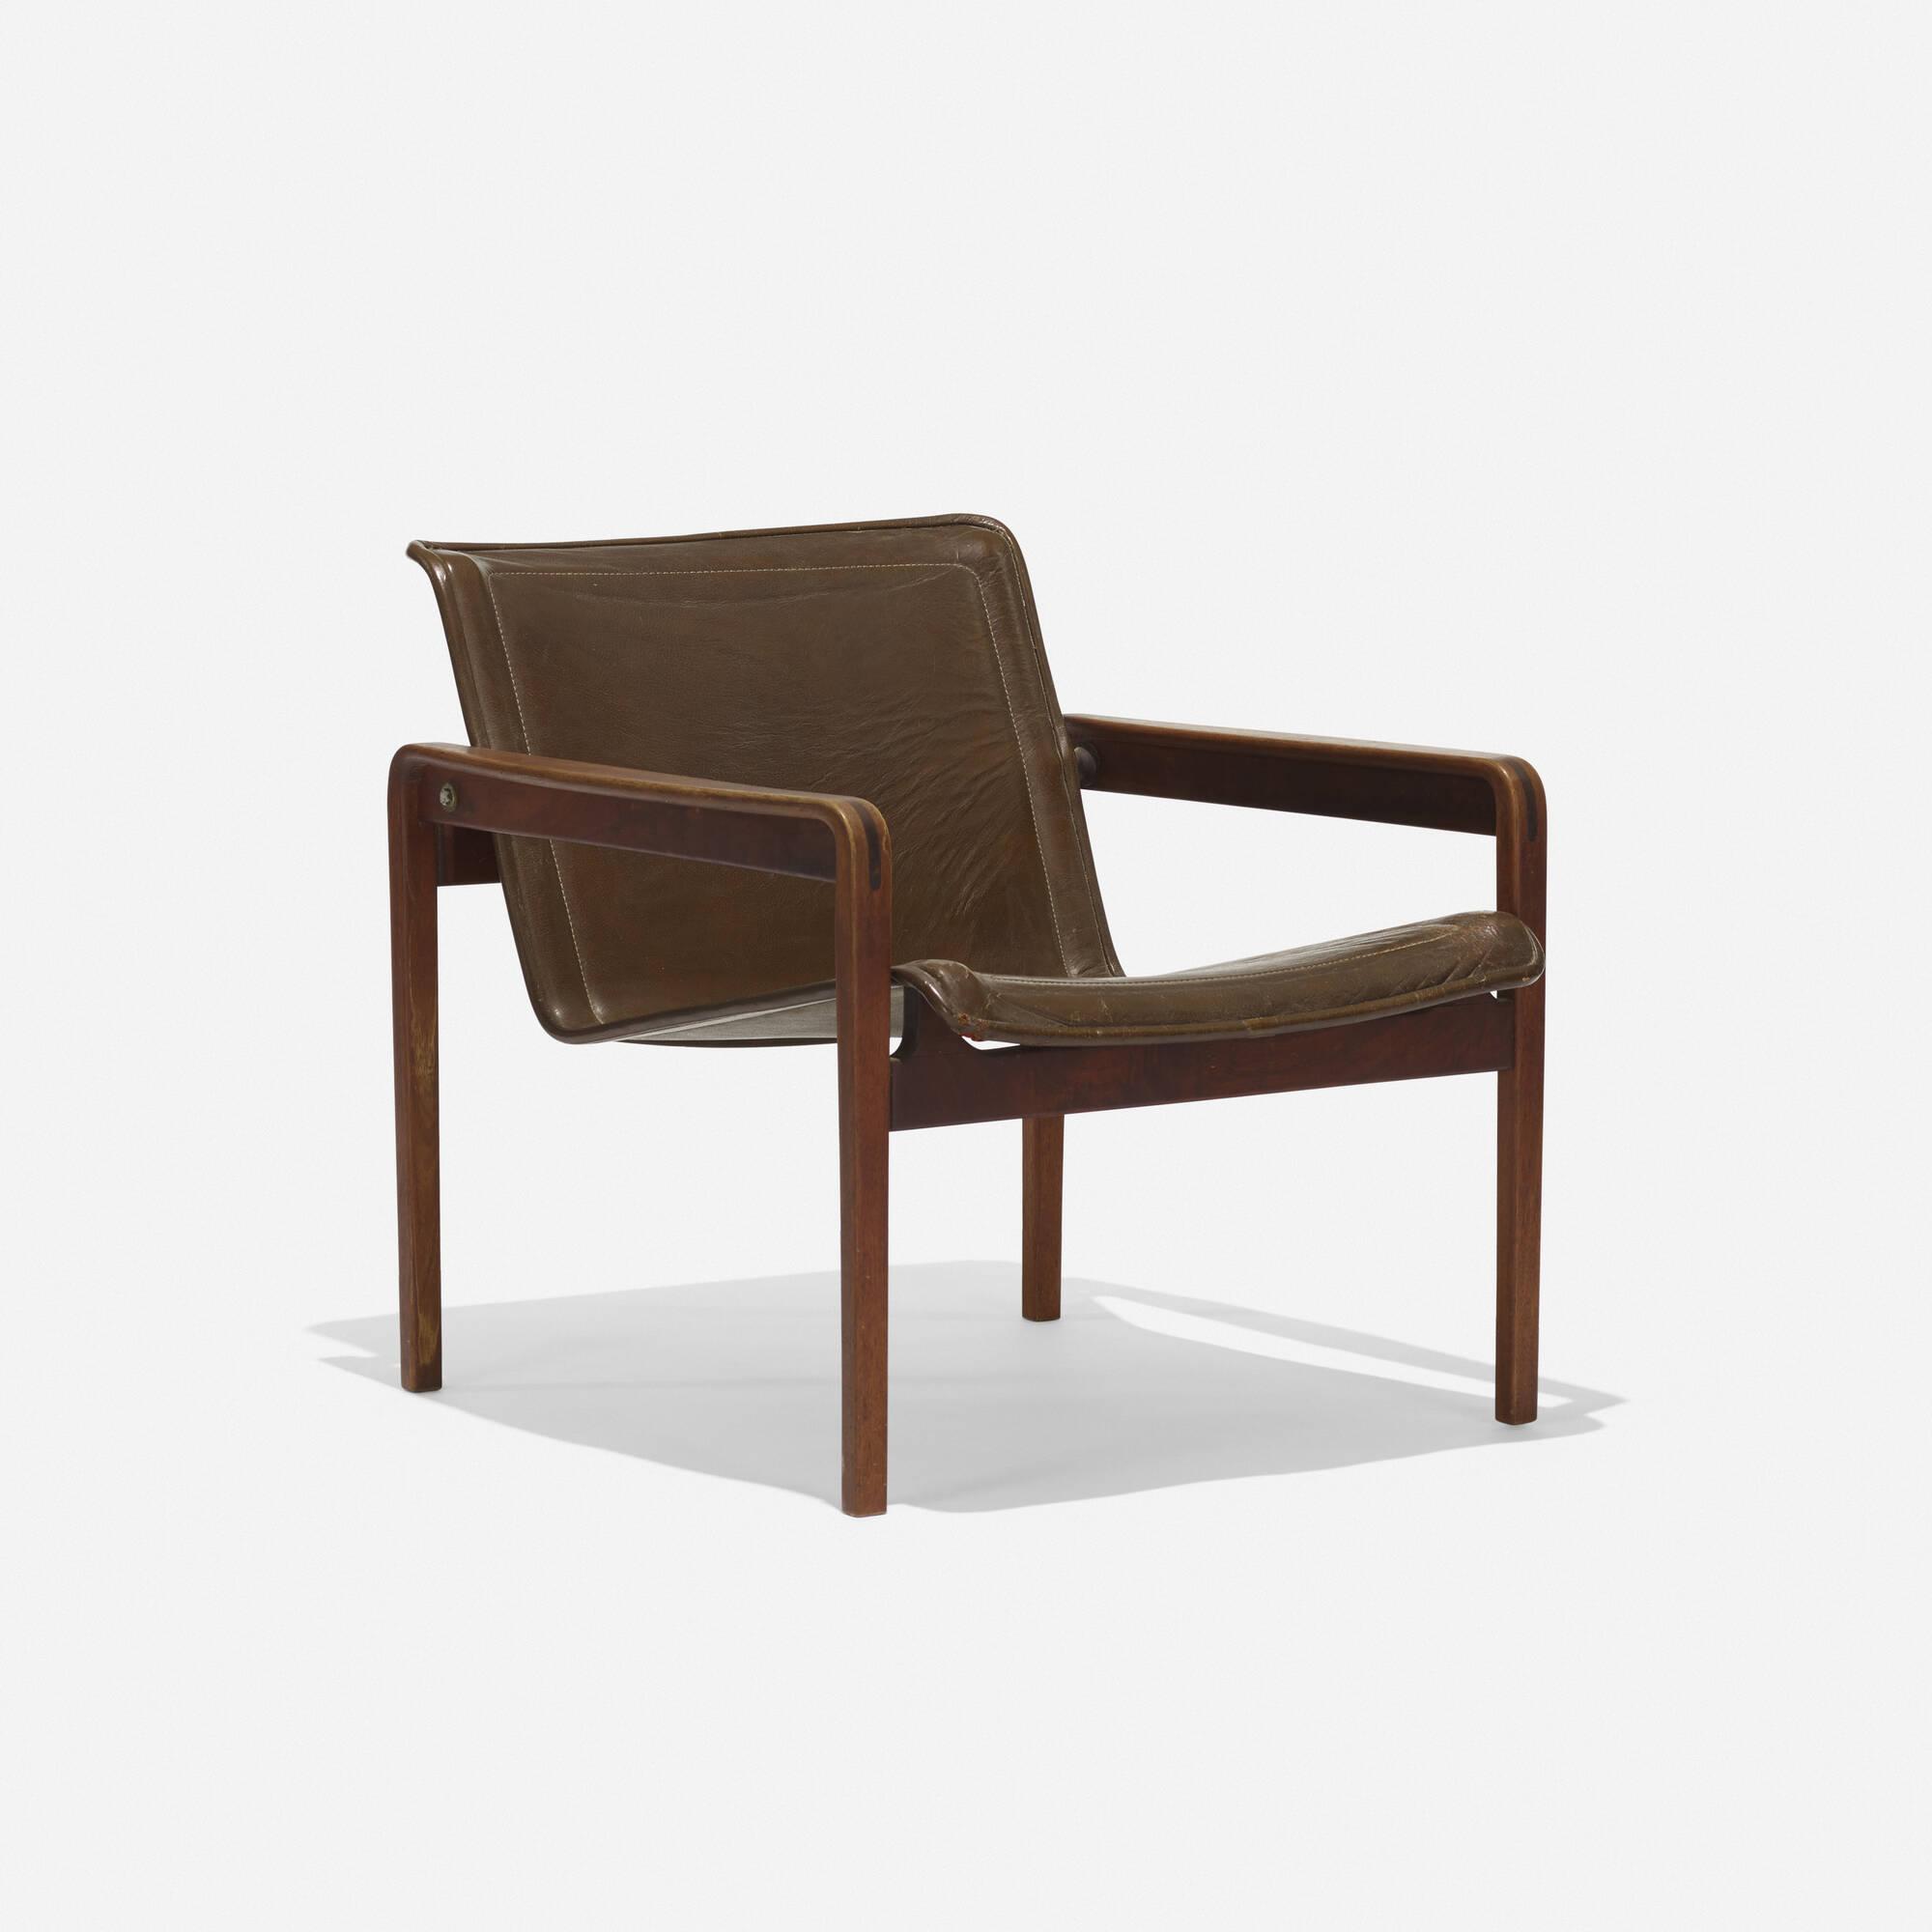 richard schultz  prototype leisure collection armchair  the  -  richard schultz  prototype leisure collection armchair ( of )